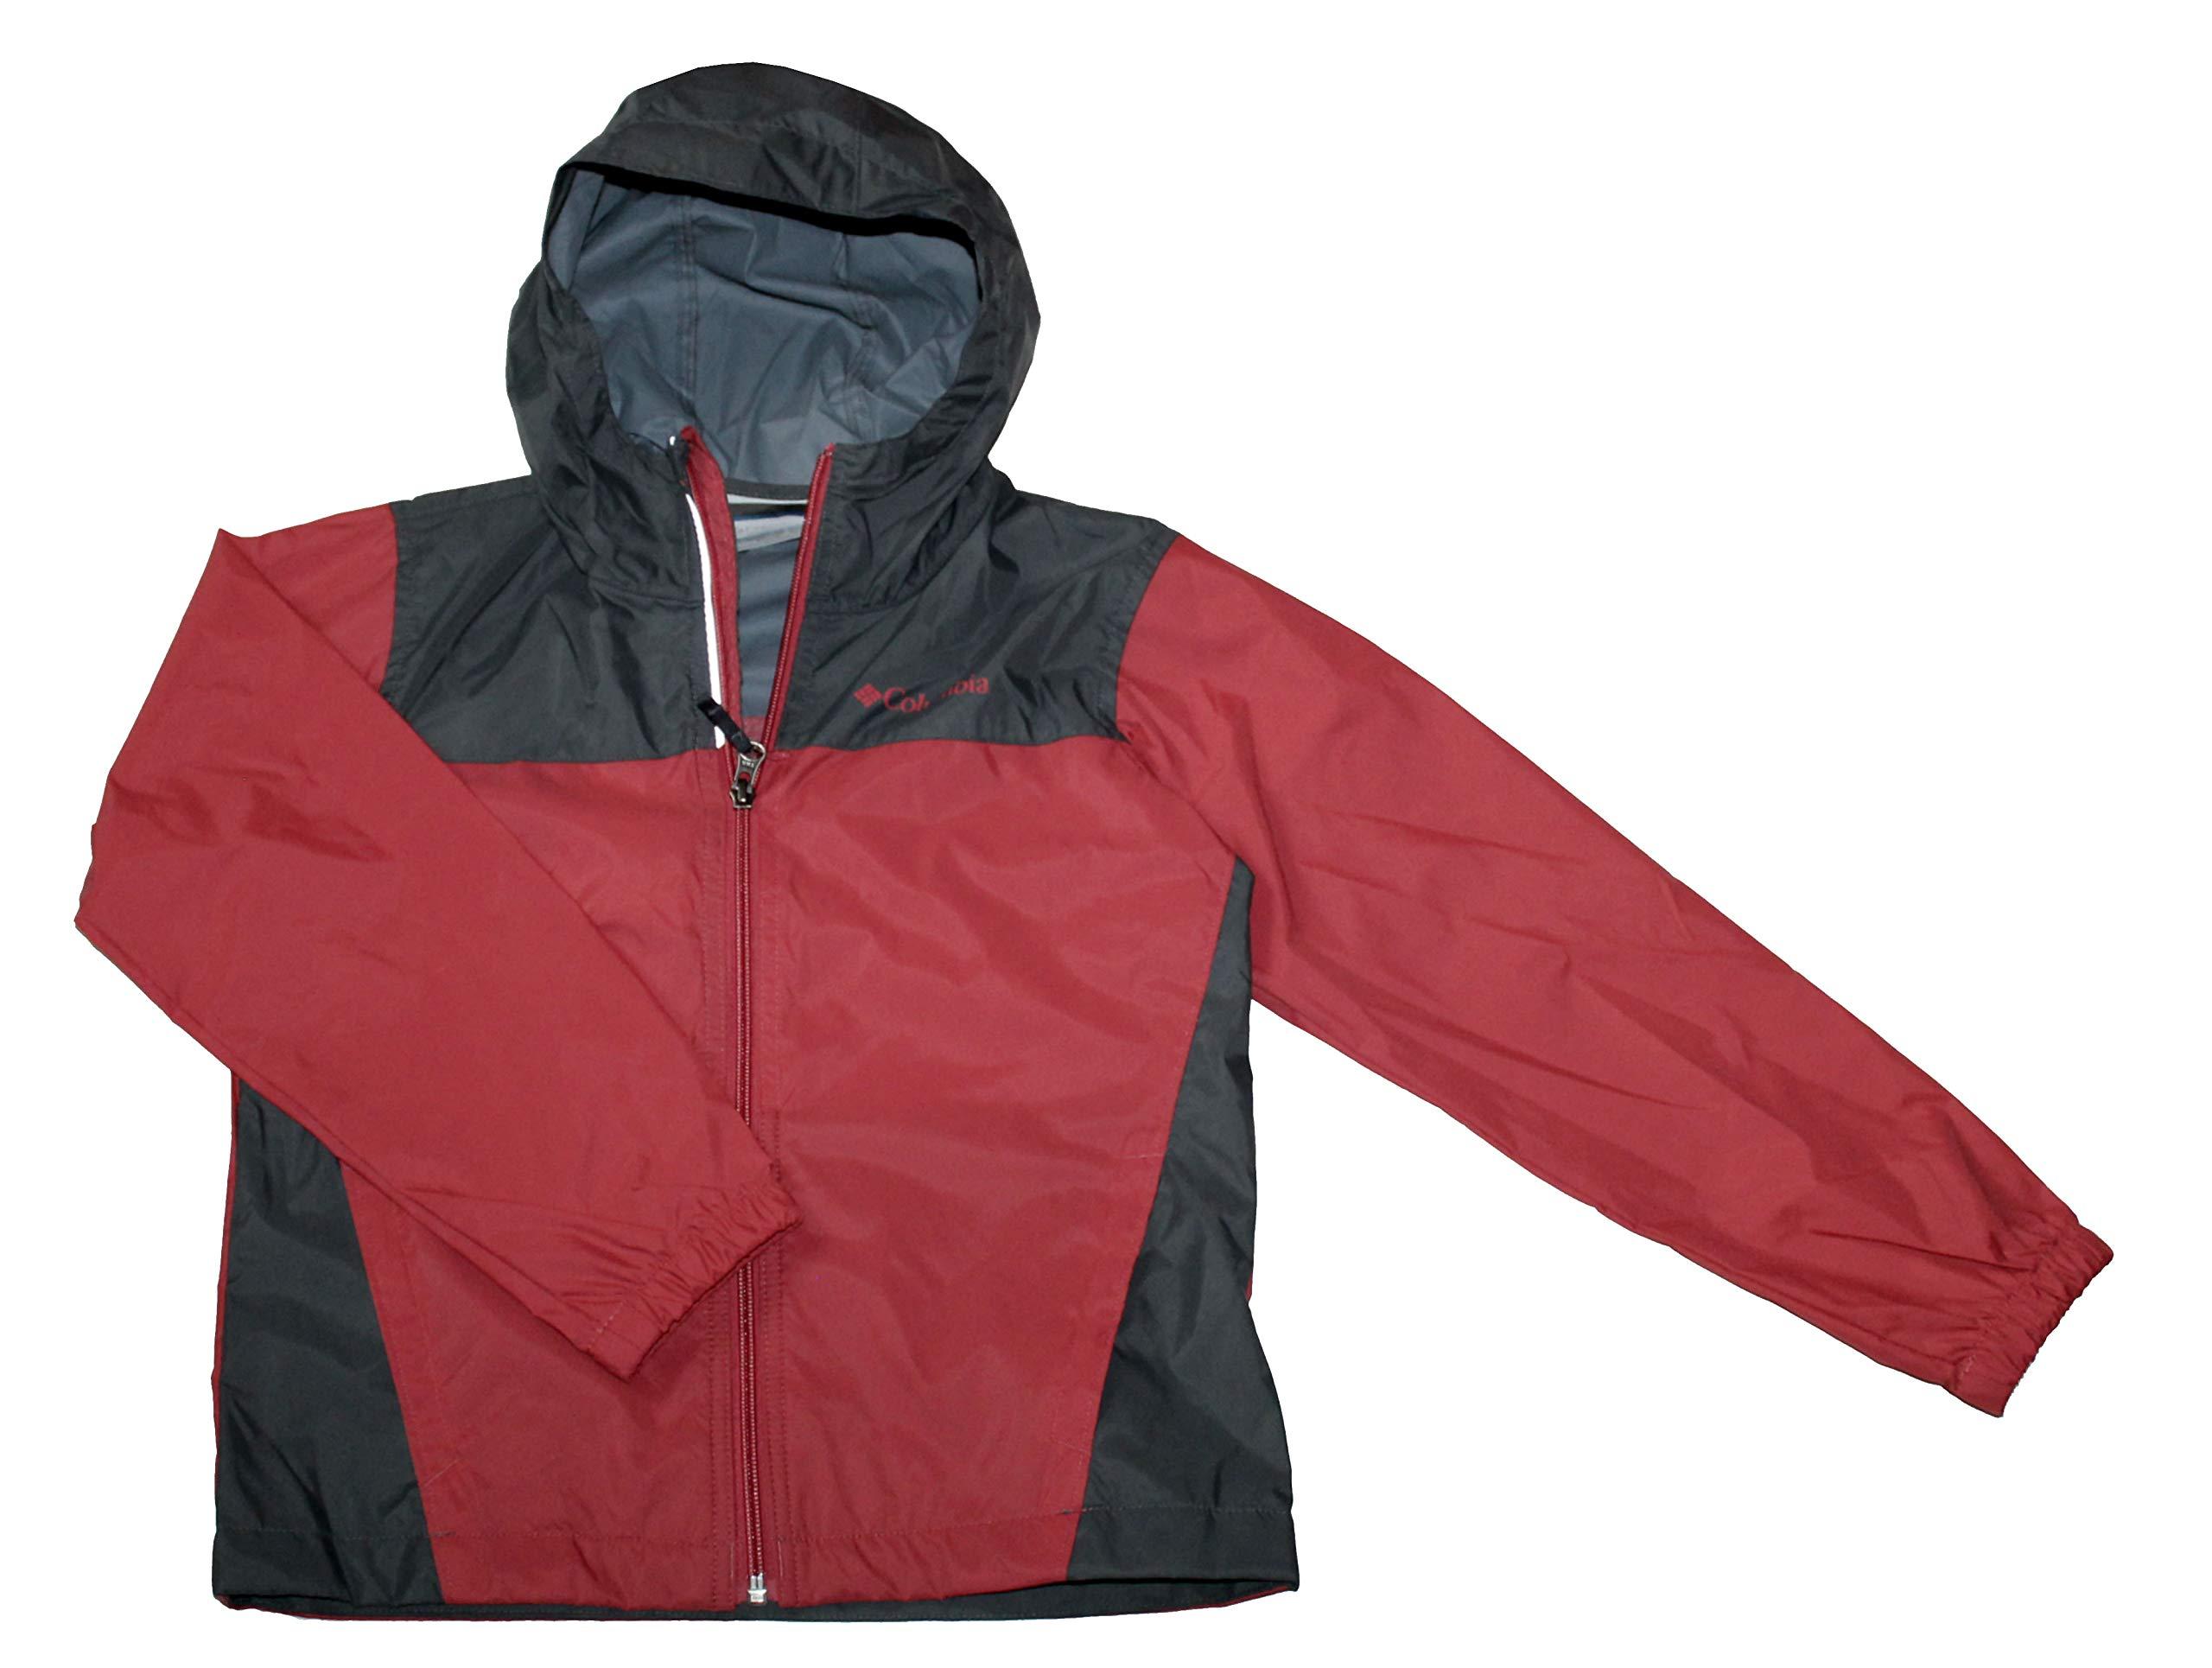 Columbia Youth Boys Raincreek Falls Rain Rain Jacket (Sunset Red/Grey, M 10-12)